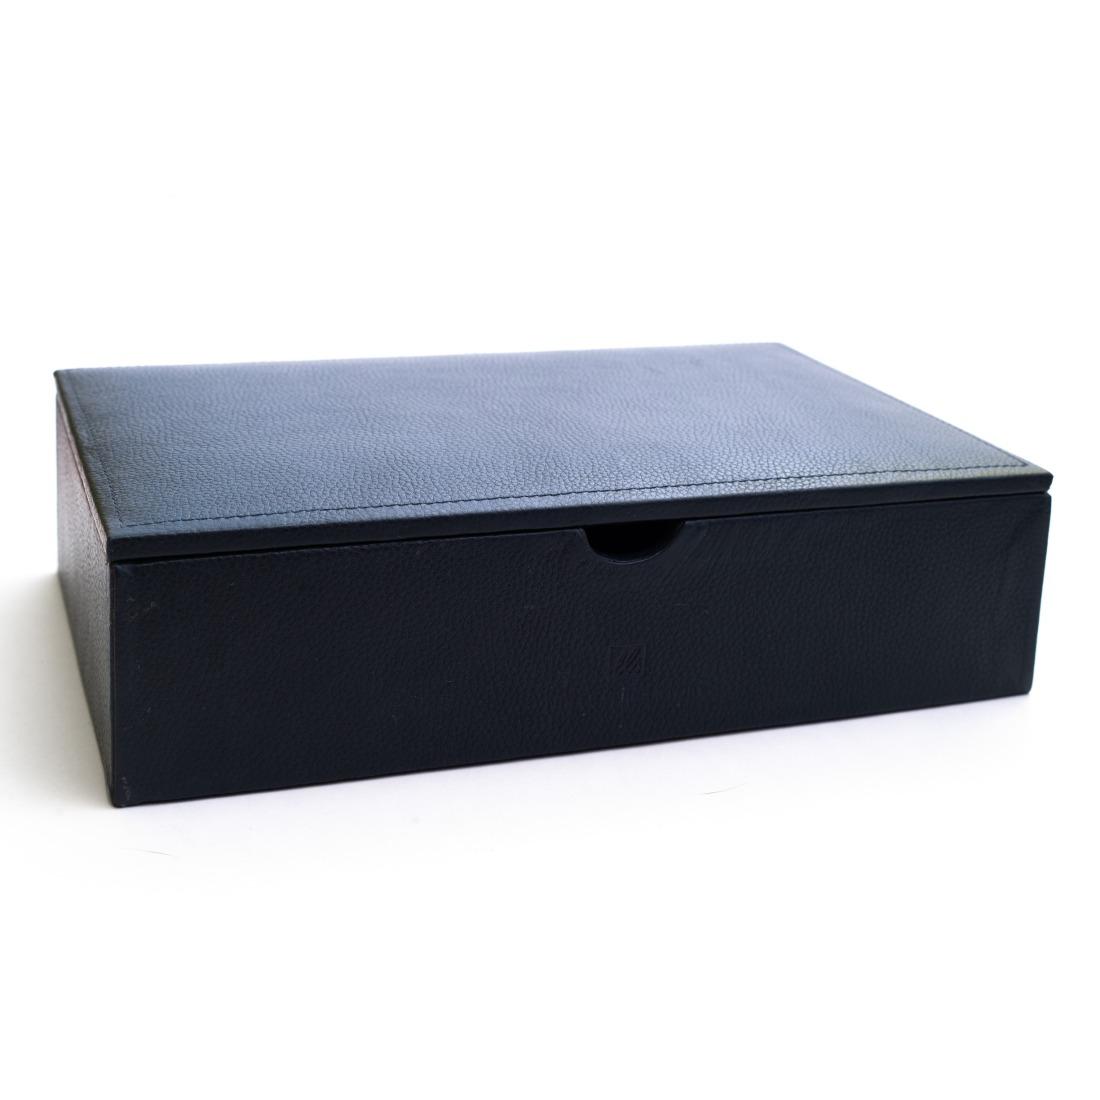 Classic Watch box